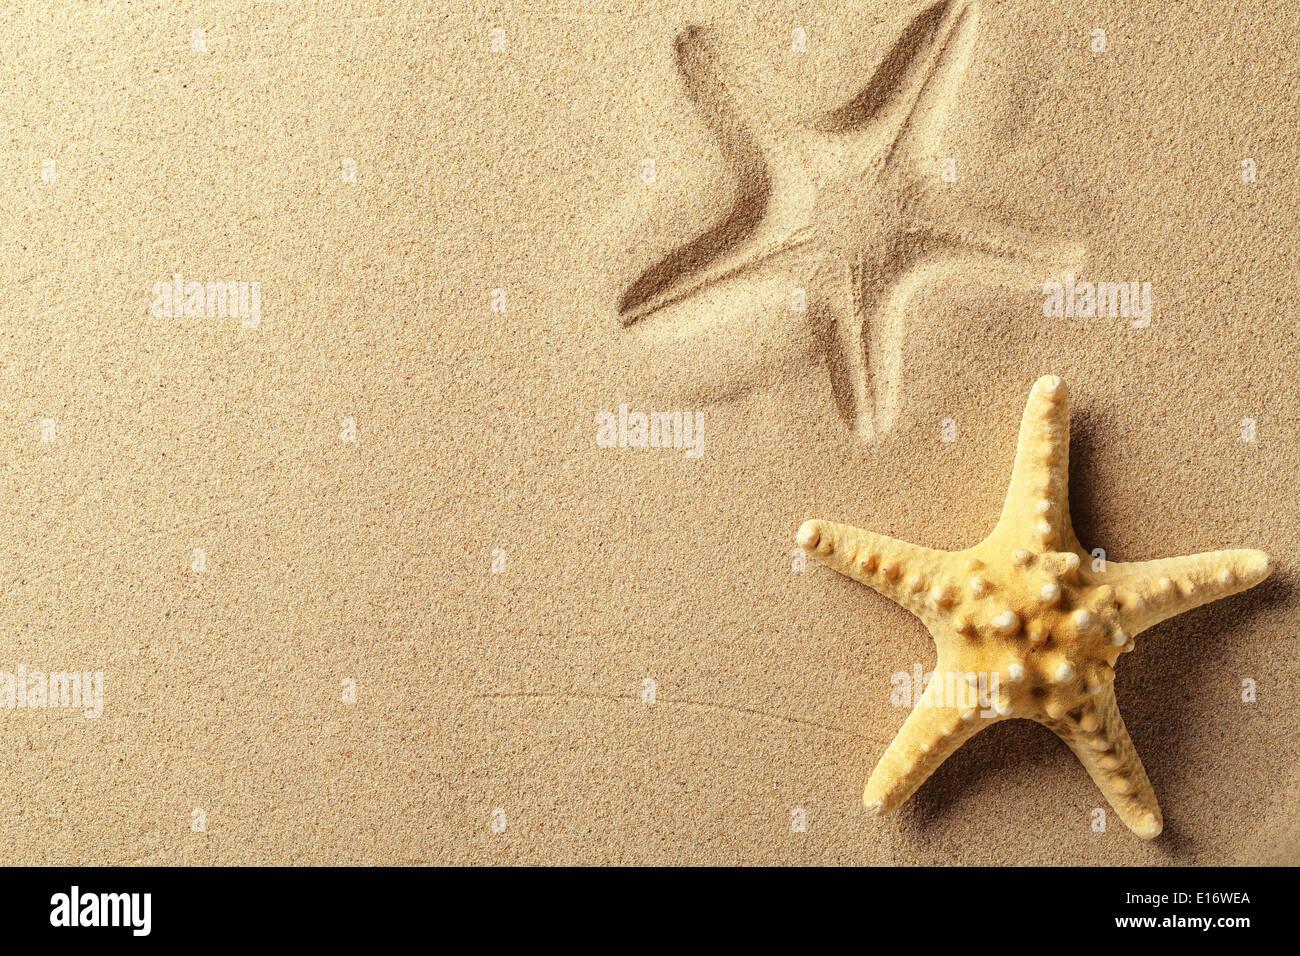 Seashell with imprint on beach sand - Stock Image